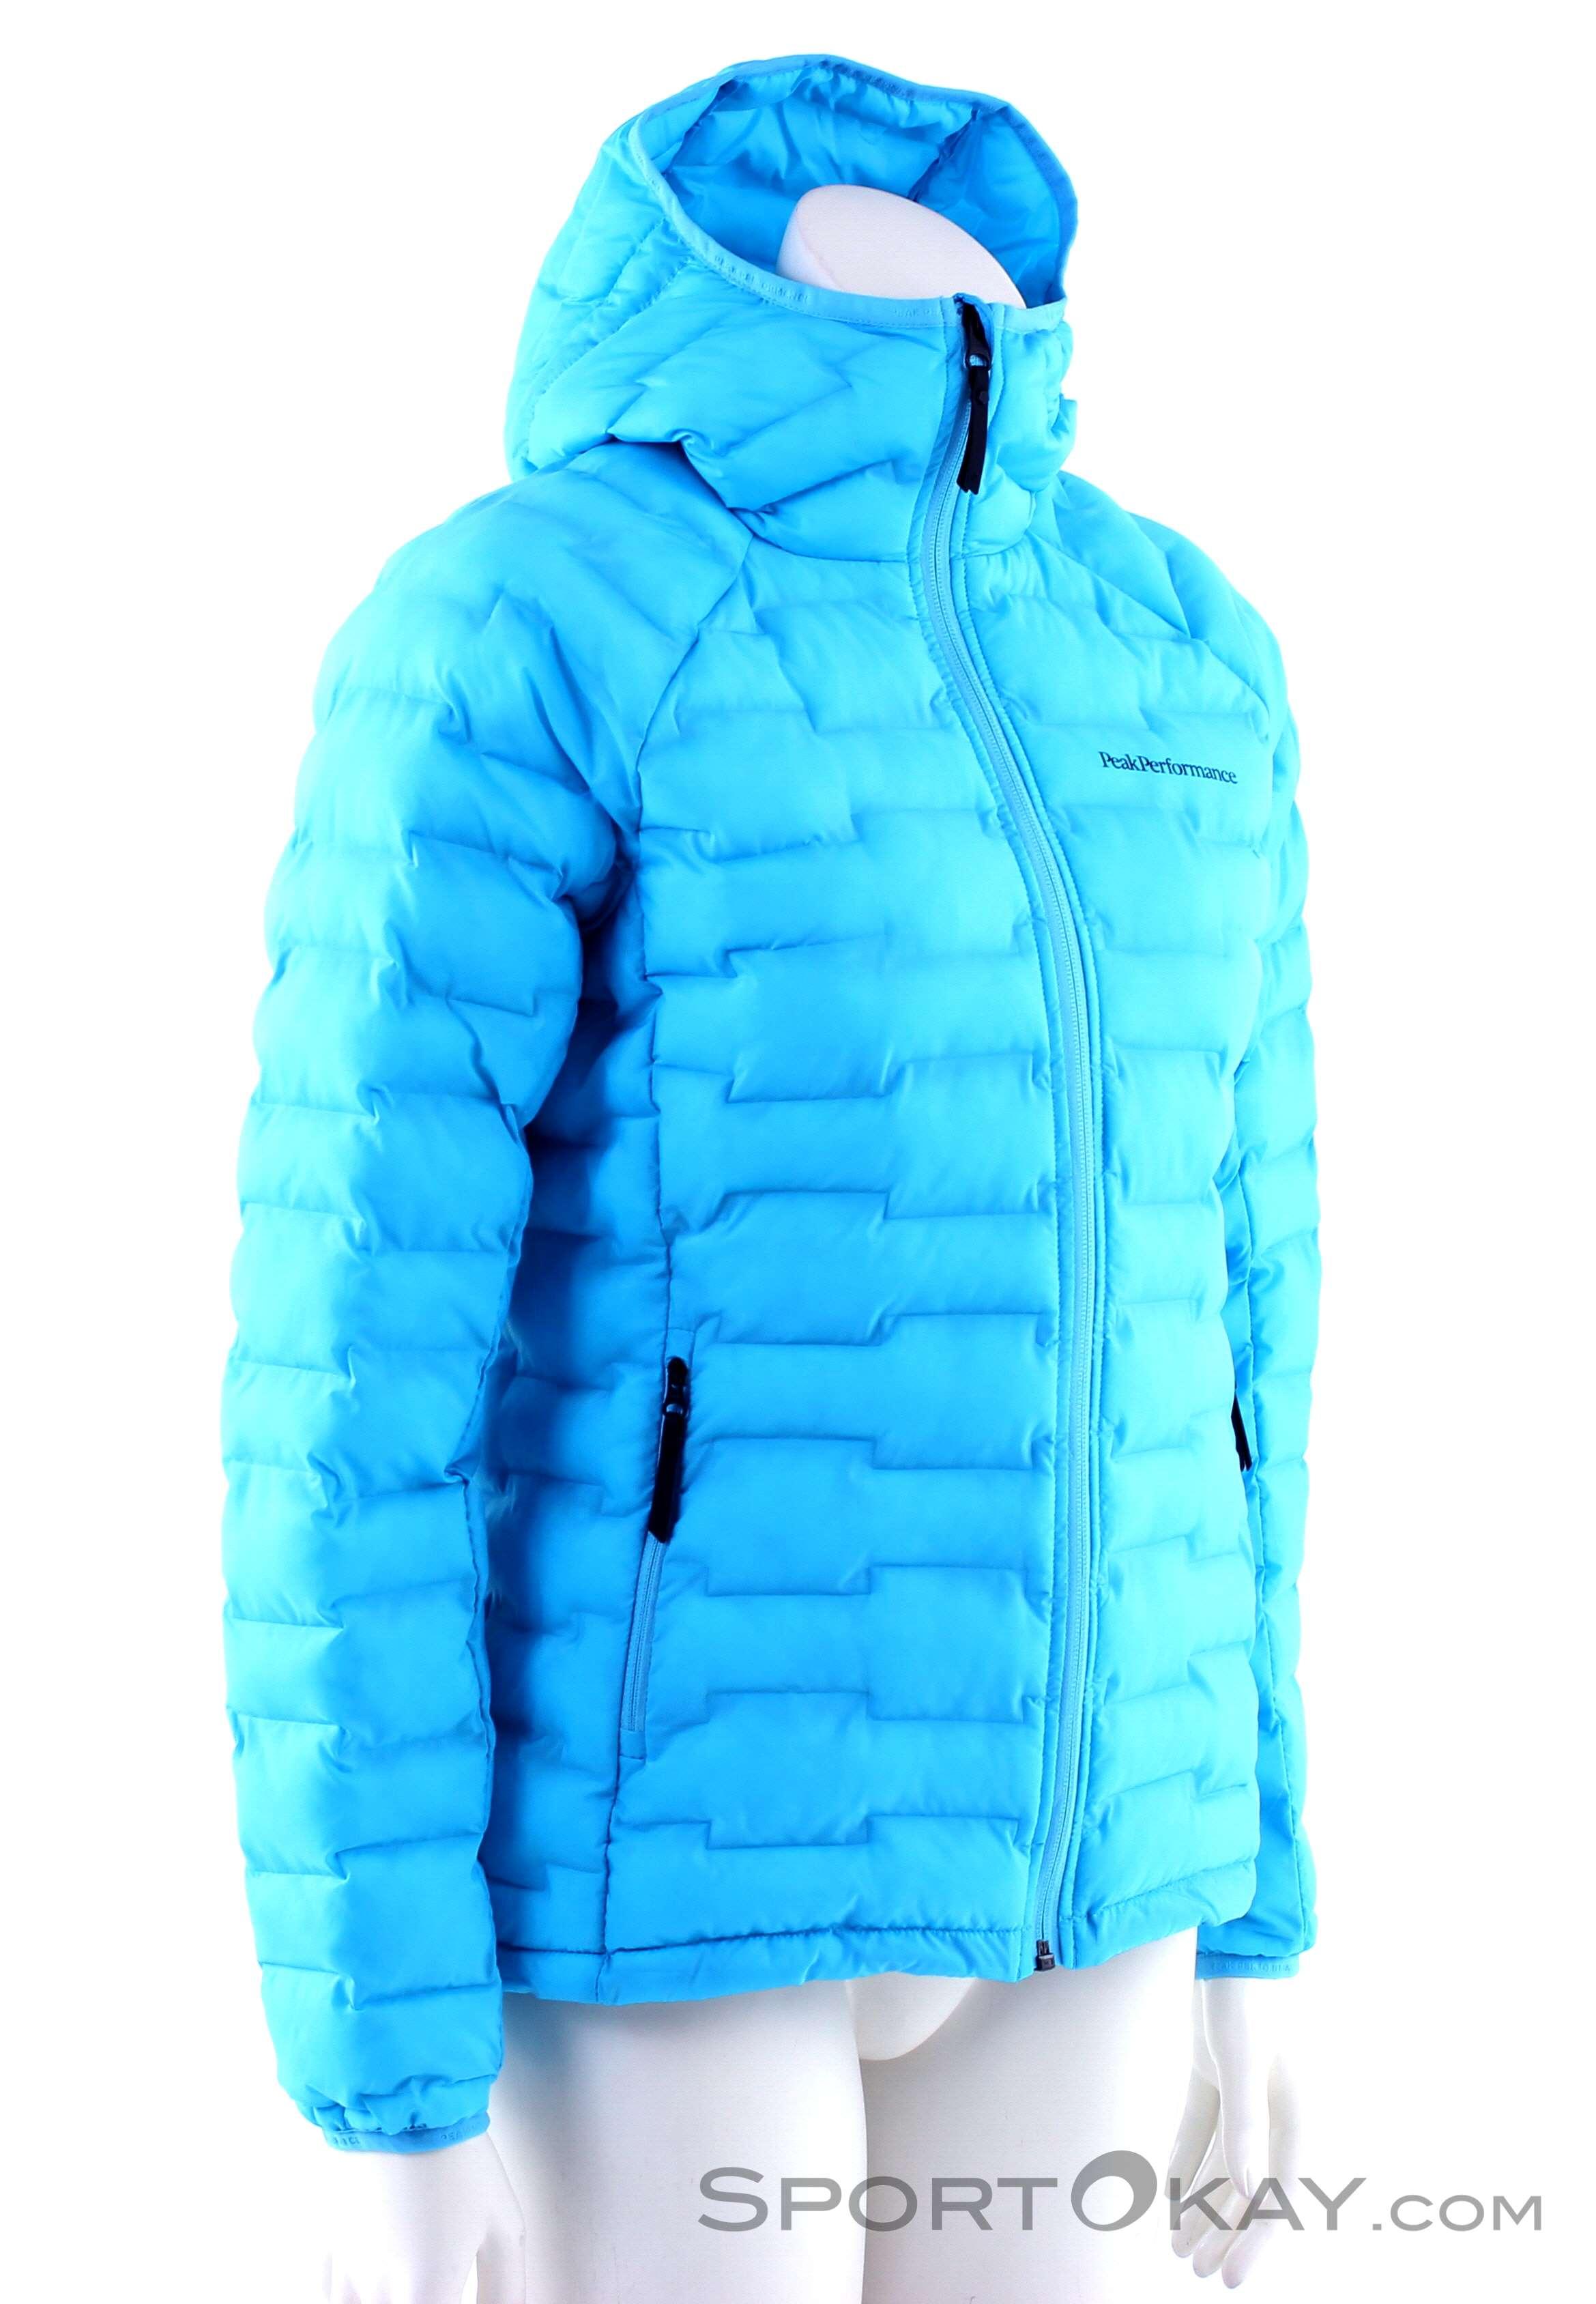 Peak Performance Peak Performance Argon Light Womens Ski Touring Jacket